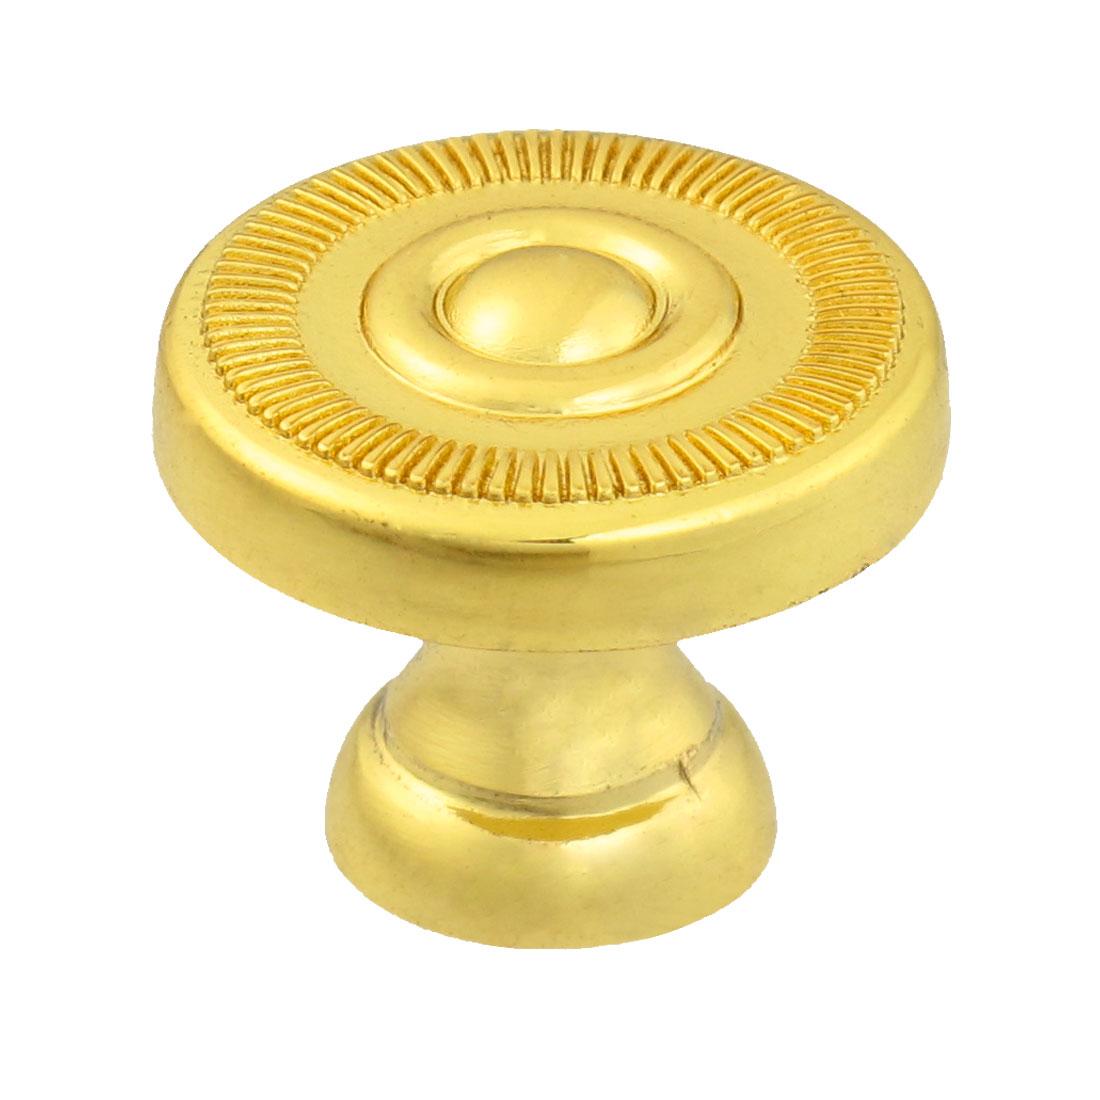 "Cabinet Drawer Gold Tone 2cm 0.8"" Diameter Metal Round Pull Knob"